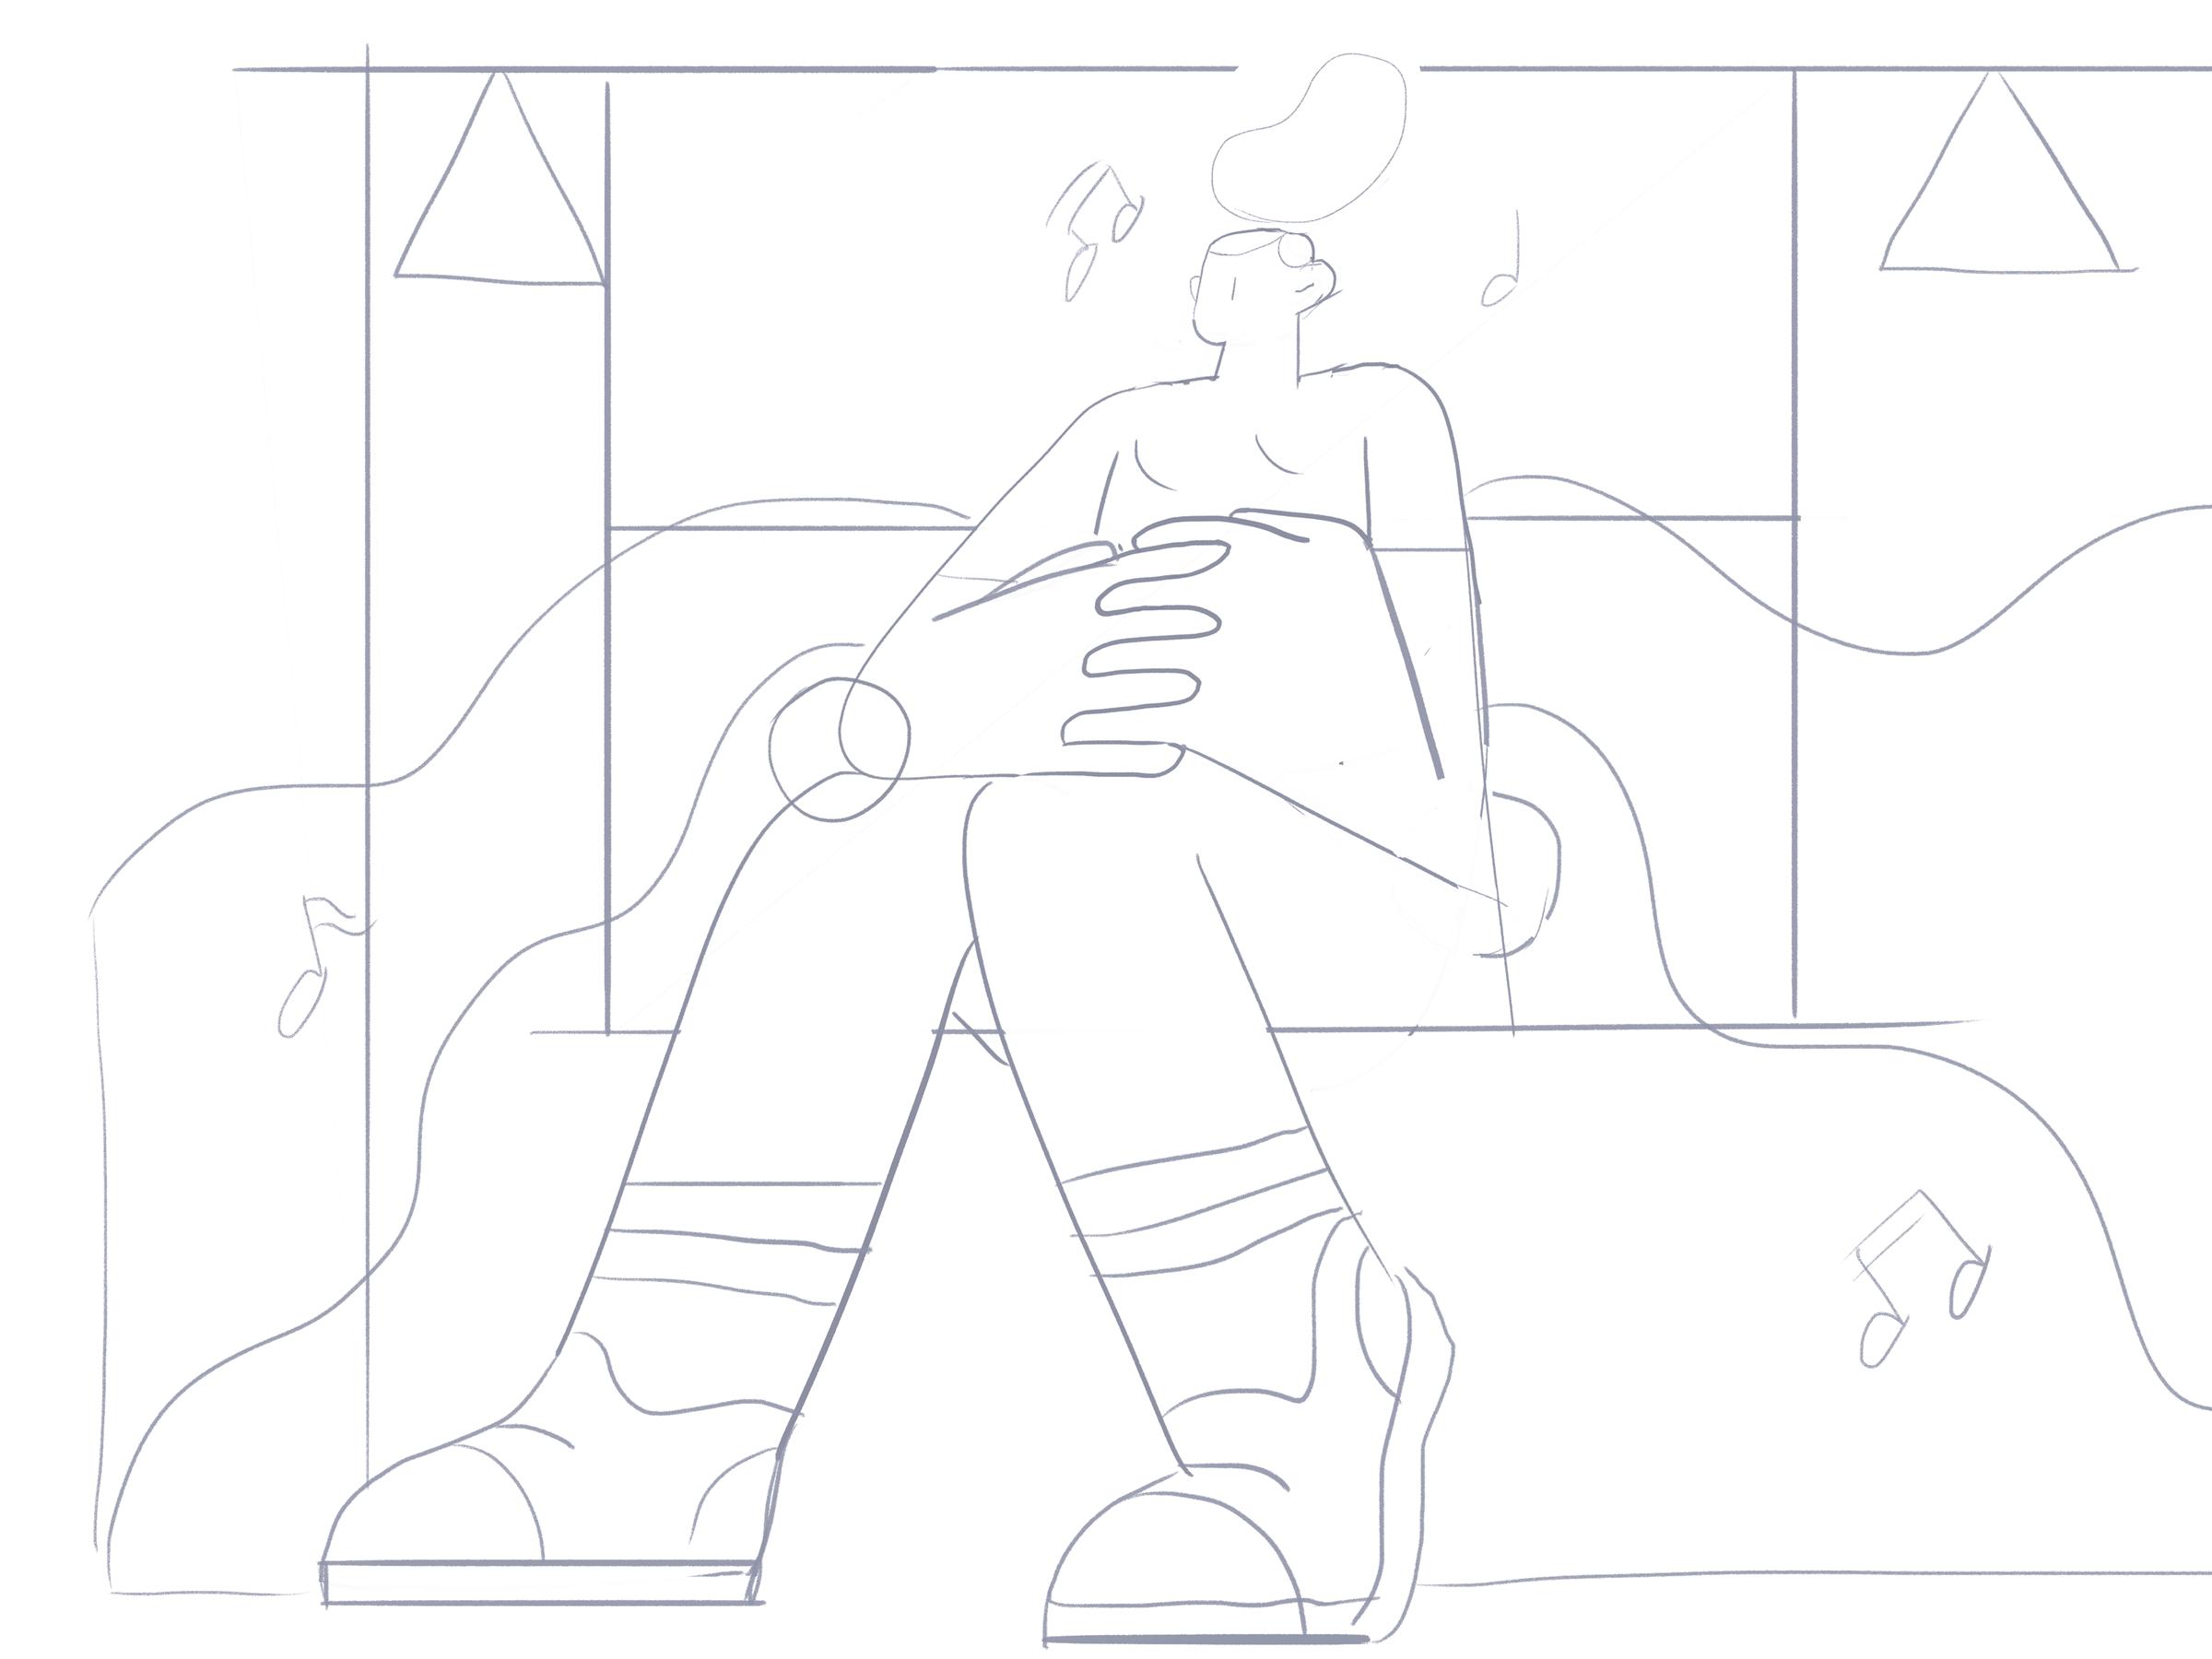 Train ride sketch